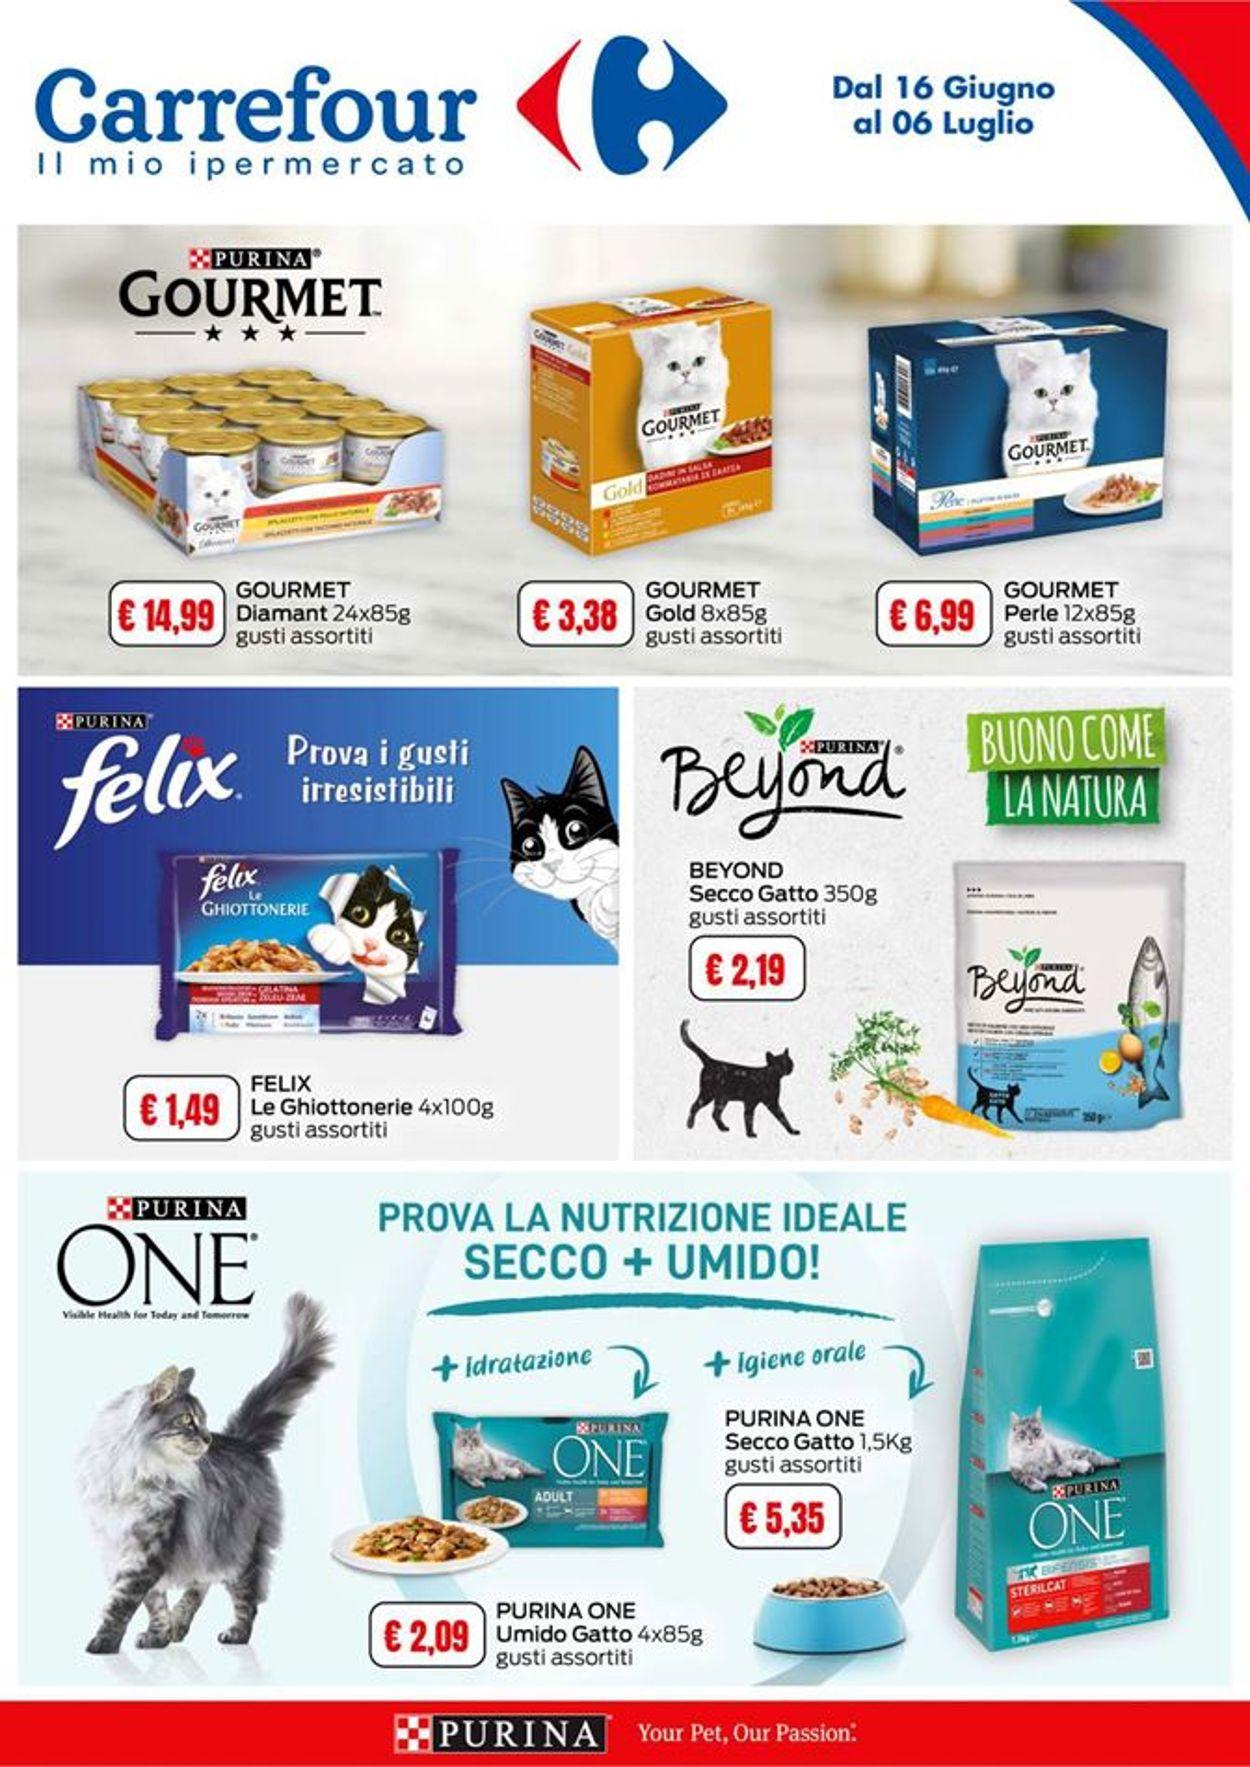 Volantino Carrefour - Offerte 16/06-06/07/2020